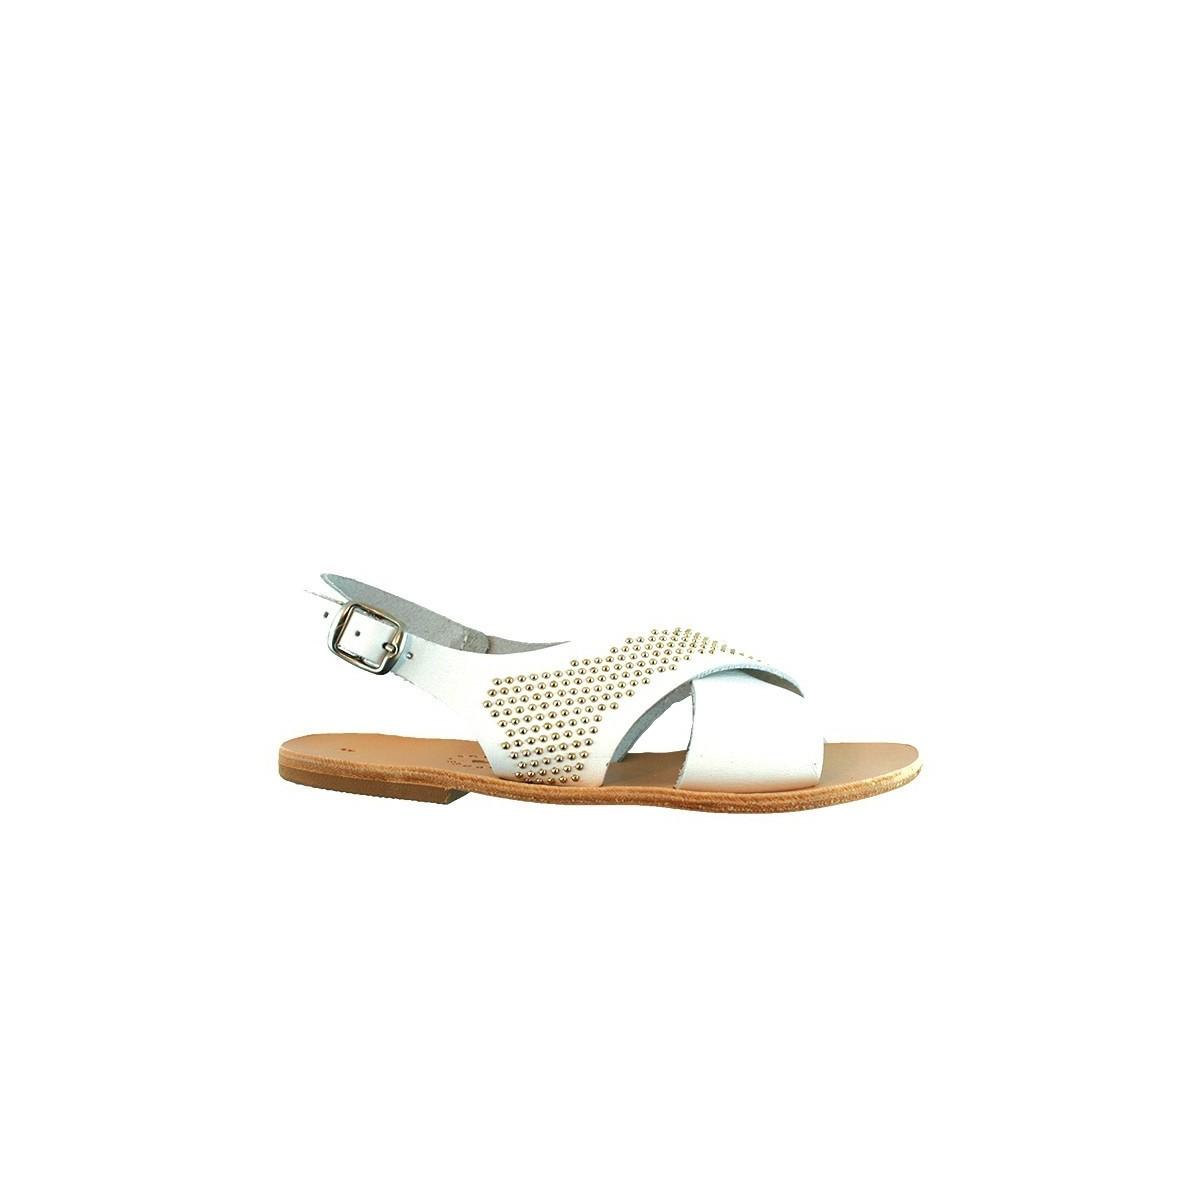 Sandale Greque Elos Blanc/Clou doré